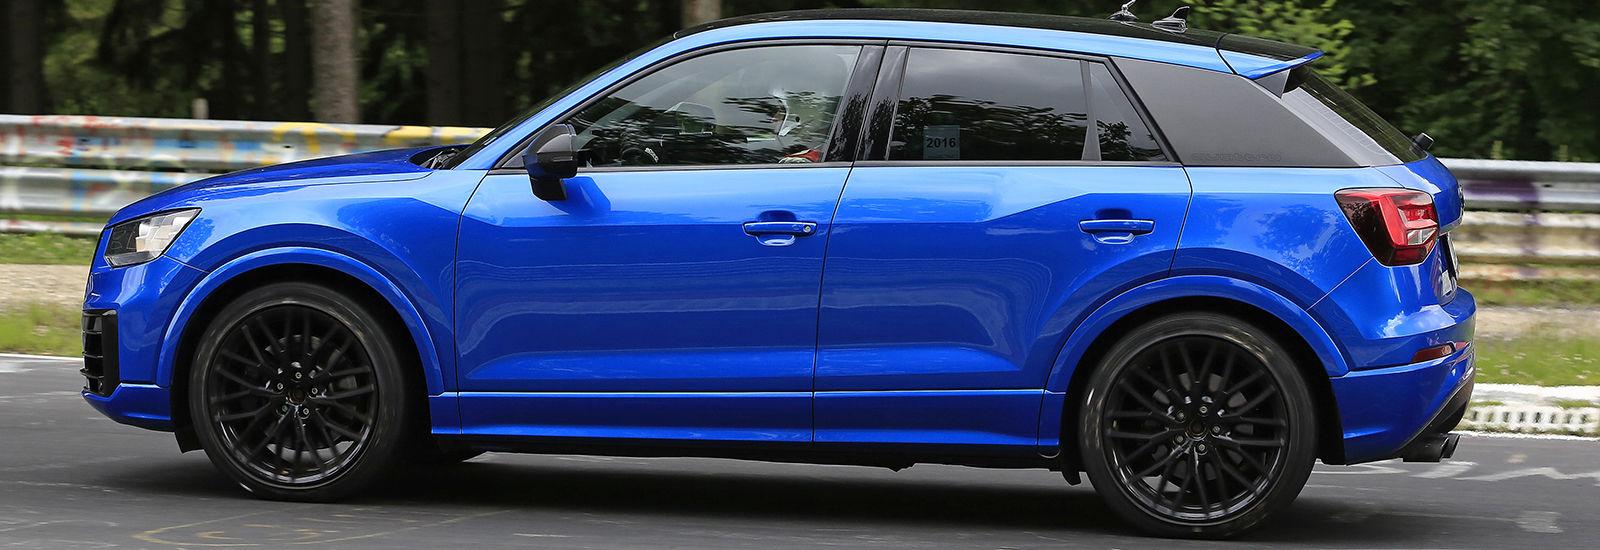 Audi Sq2 Release Date Uk >> Audi SQ2 price, specs and release date   carwow